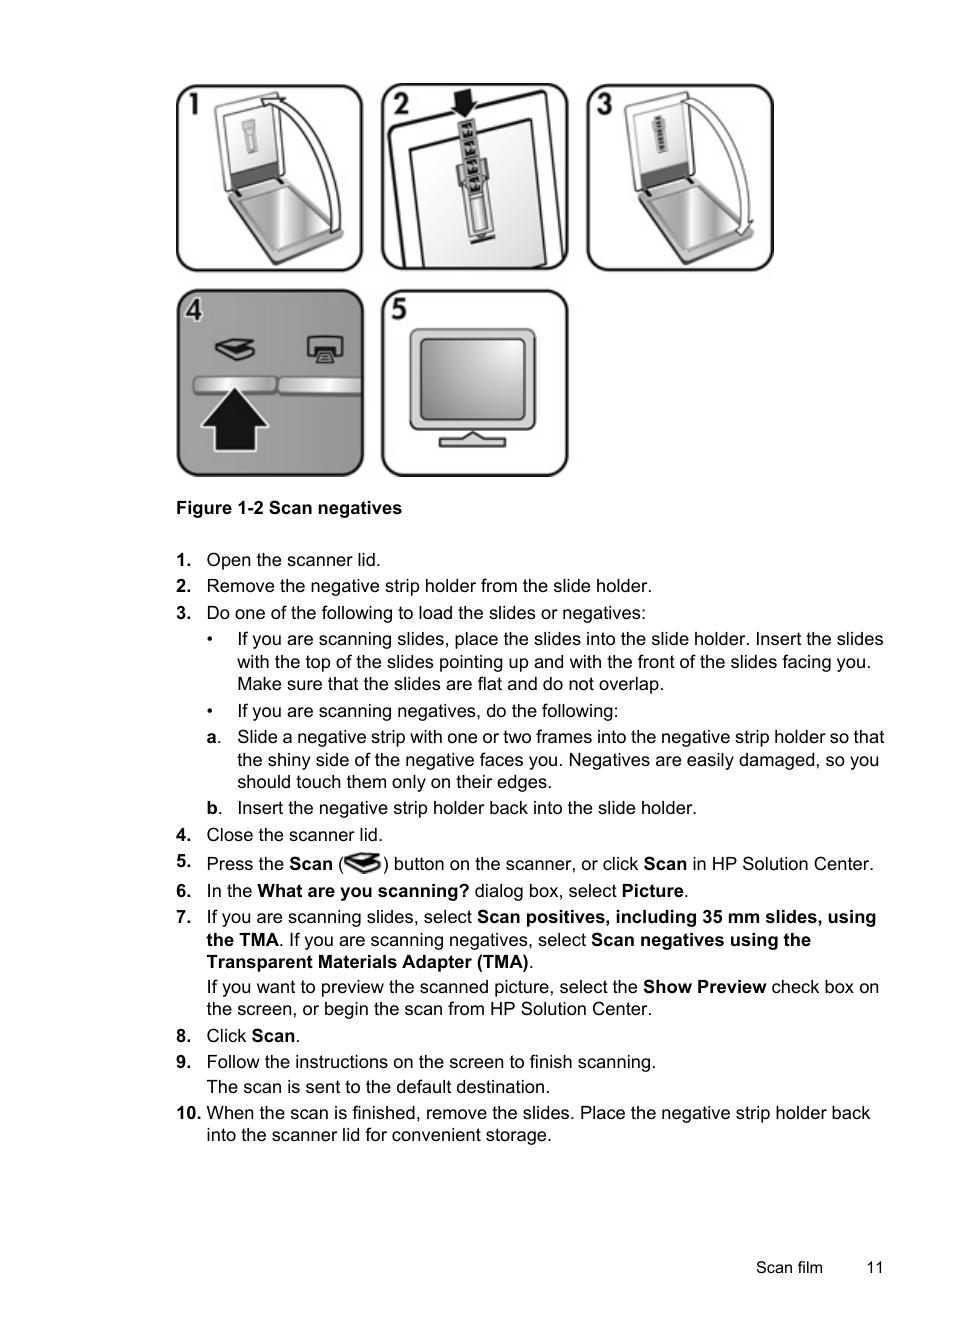 hp scanjet g2410 flatbed scanner user manual page 13 30 also rh manualsdir com  hp scanjet g2410 user manual pdf